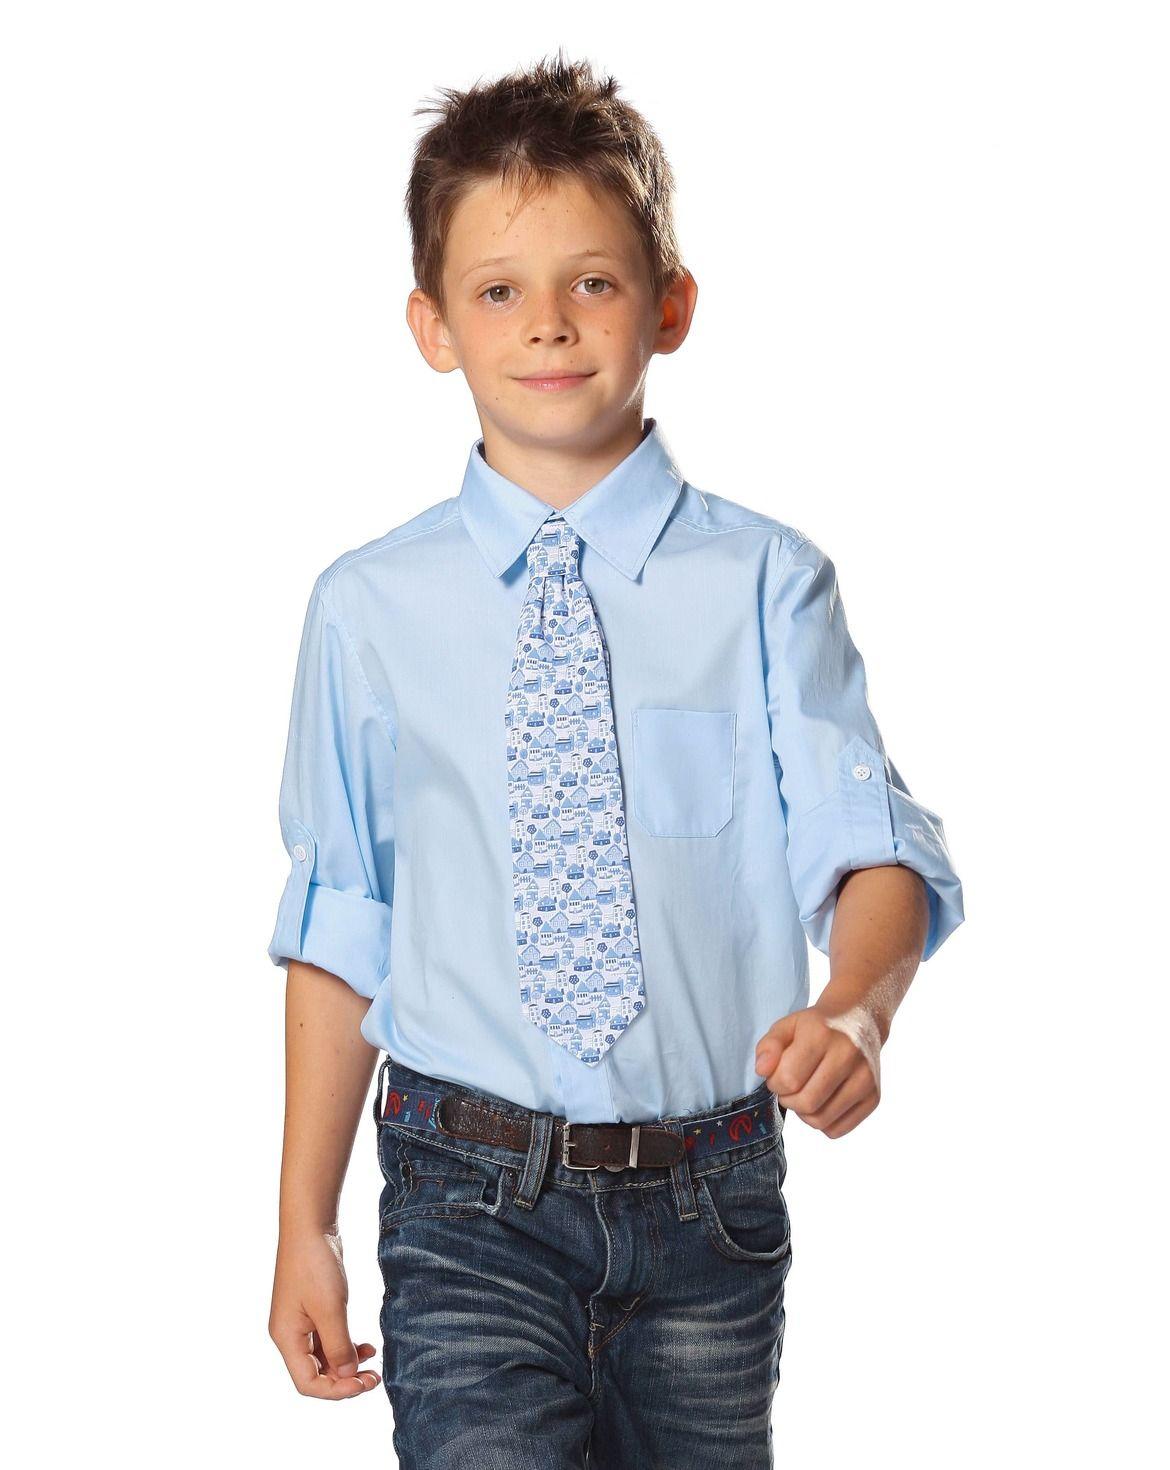 Jungen-Krawatte F/S 2011 #9524D in 2020 | Modestil ...